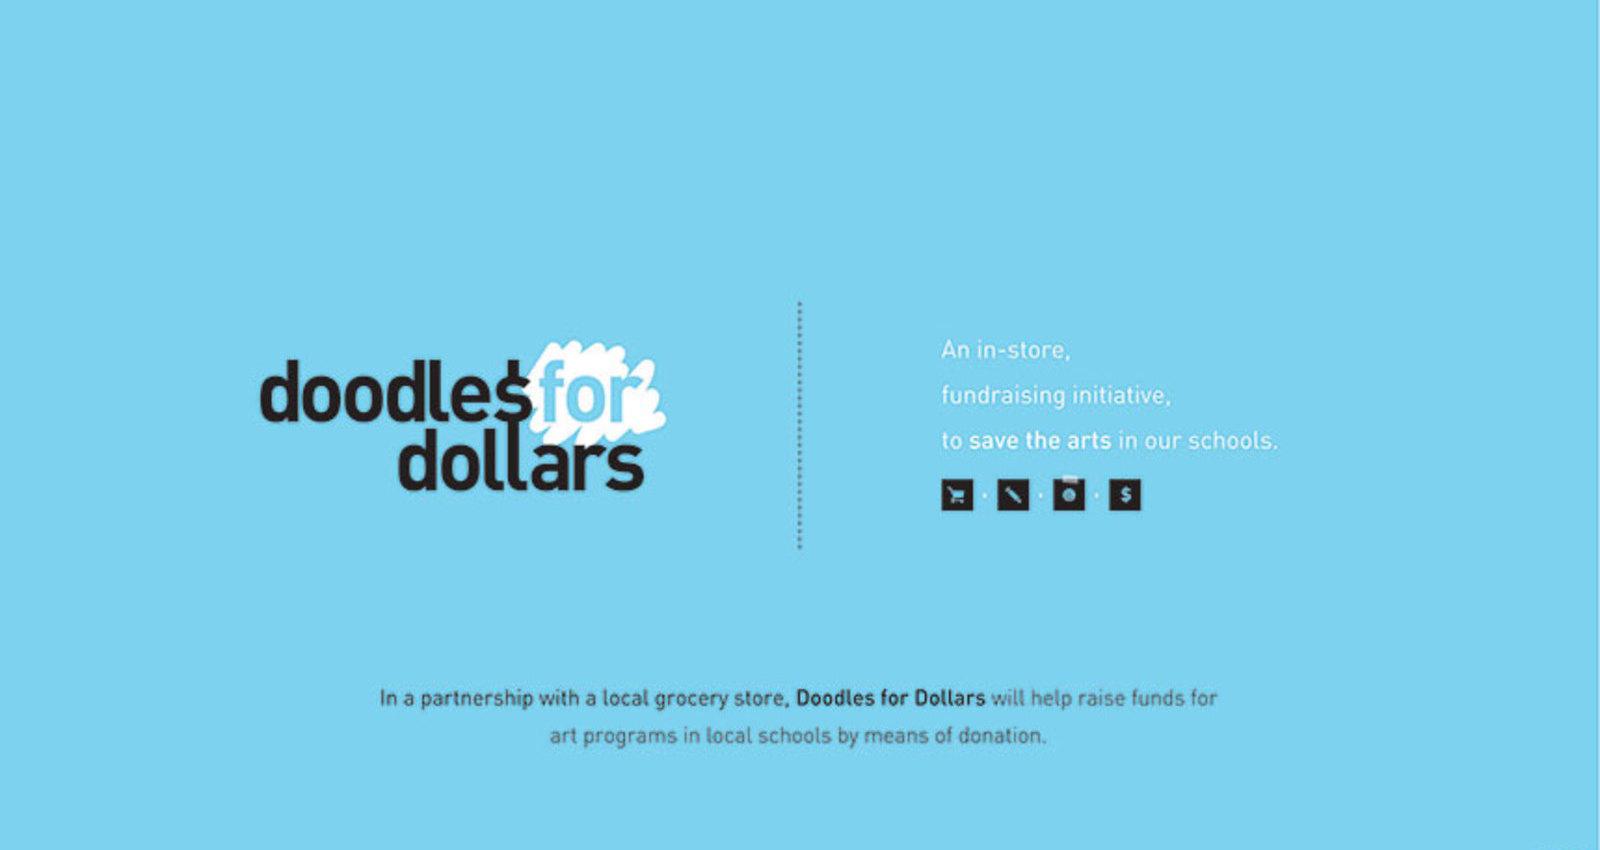 Doodles for Dollars